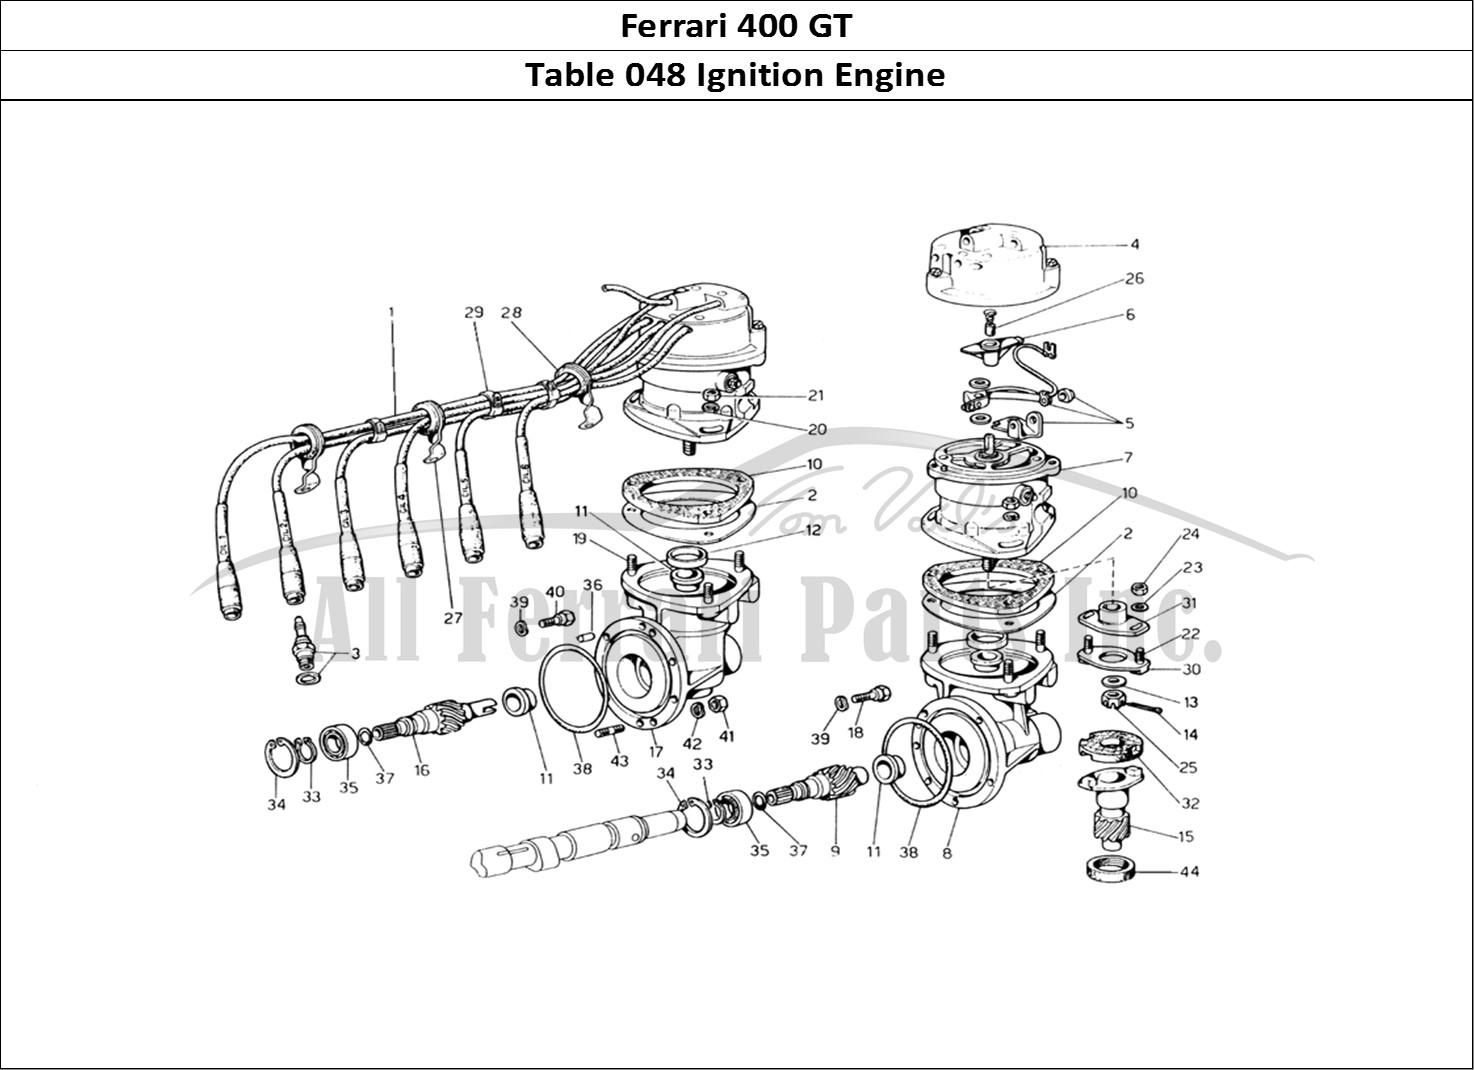 Ferrari 400 GT Mechanical Table 048 Ignition Engine